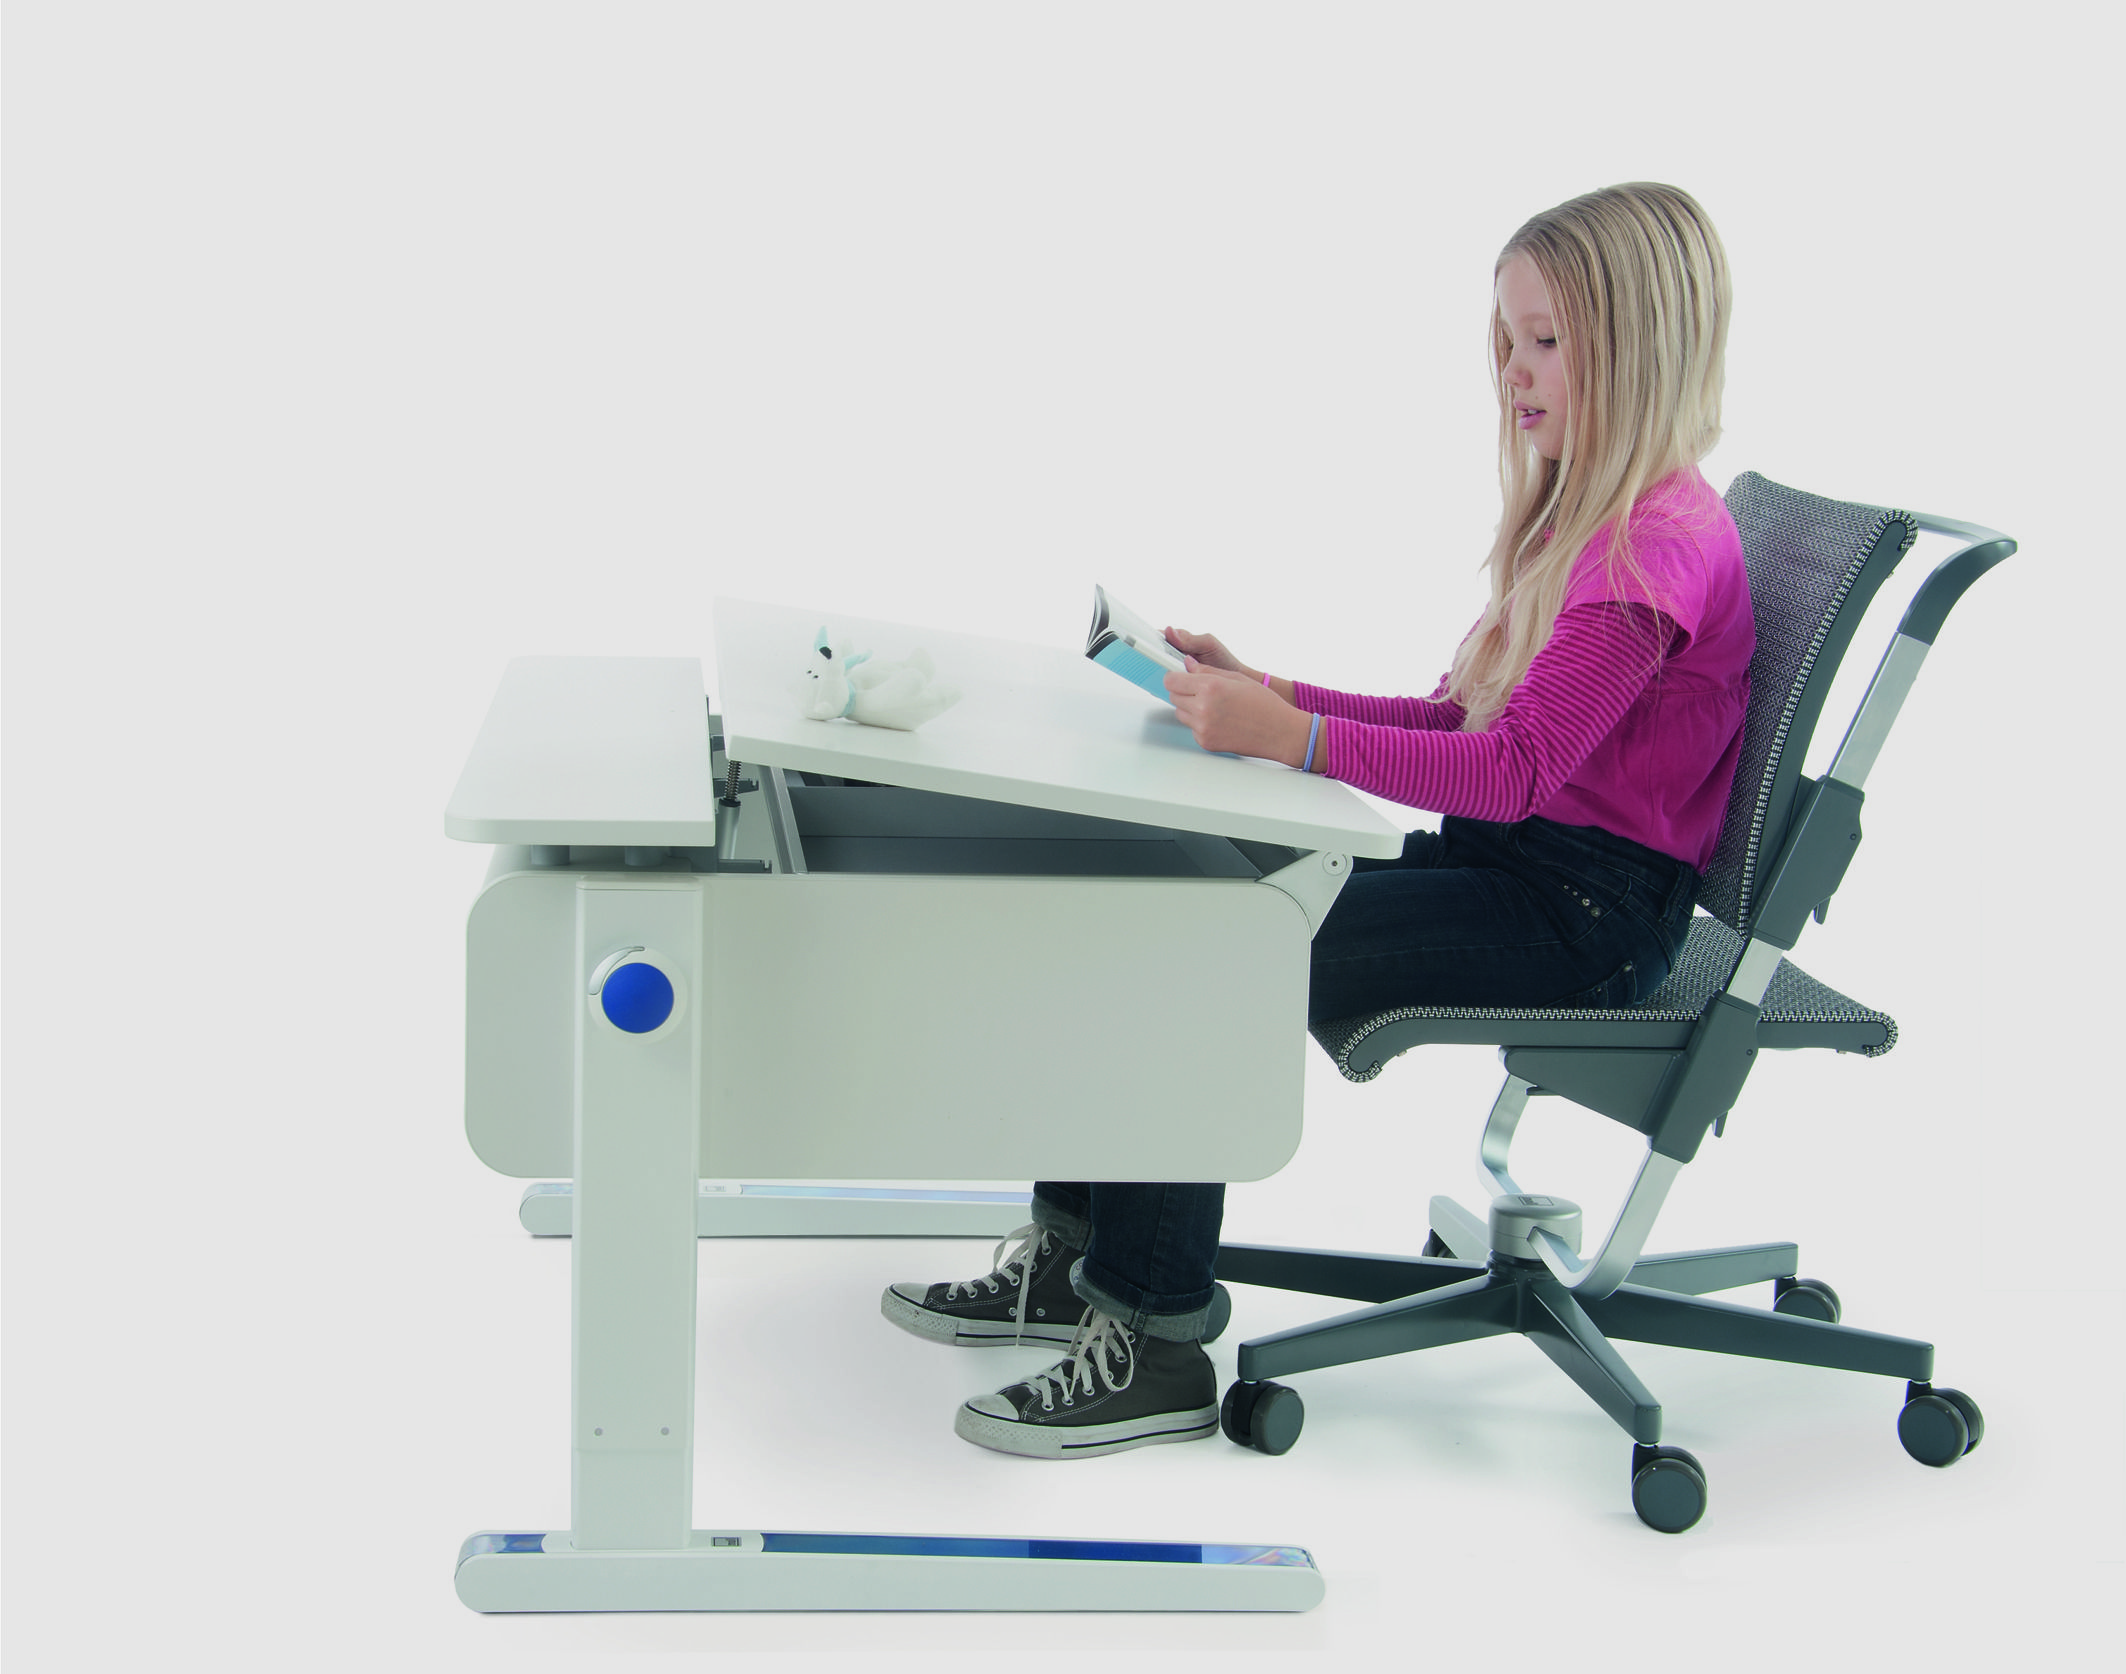 Moll Champion Ergonomic Study Desk For Kids Teens And Grown Ups Http Www Ergokid Com Stuhle Fur Kinder Schreibtisch Tisch